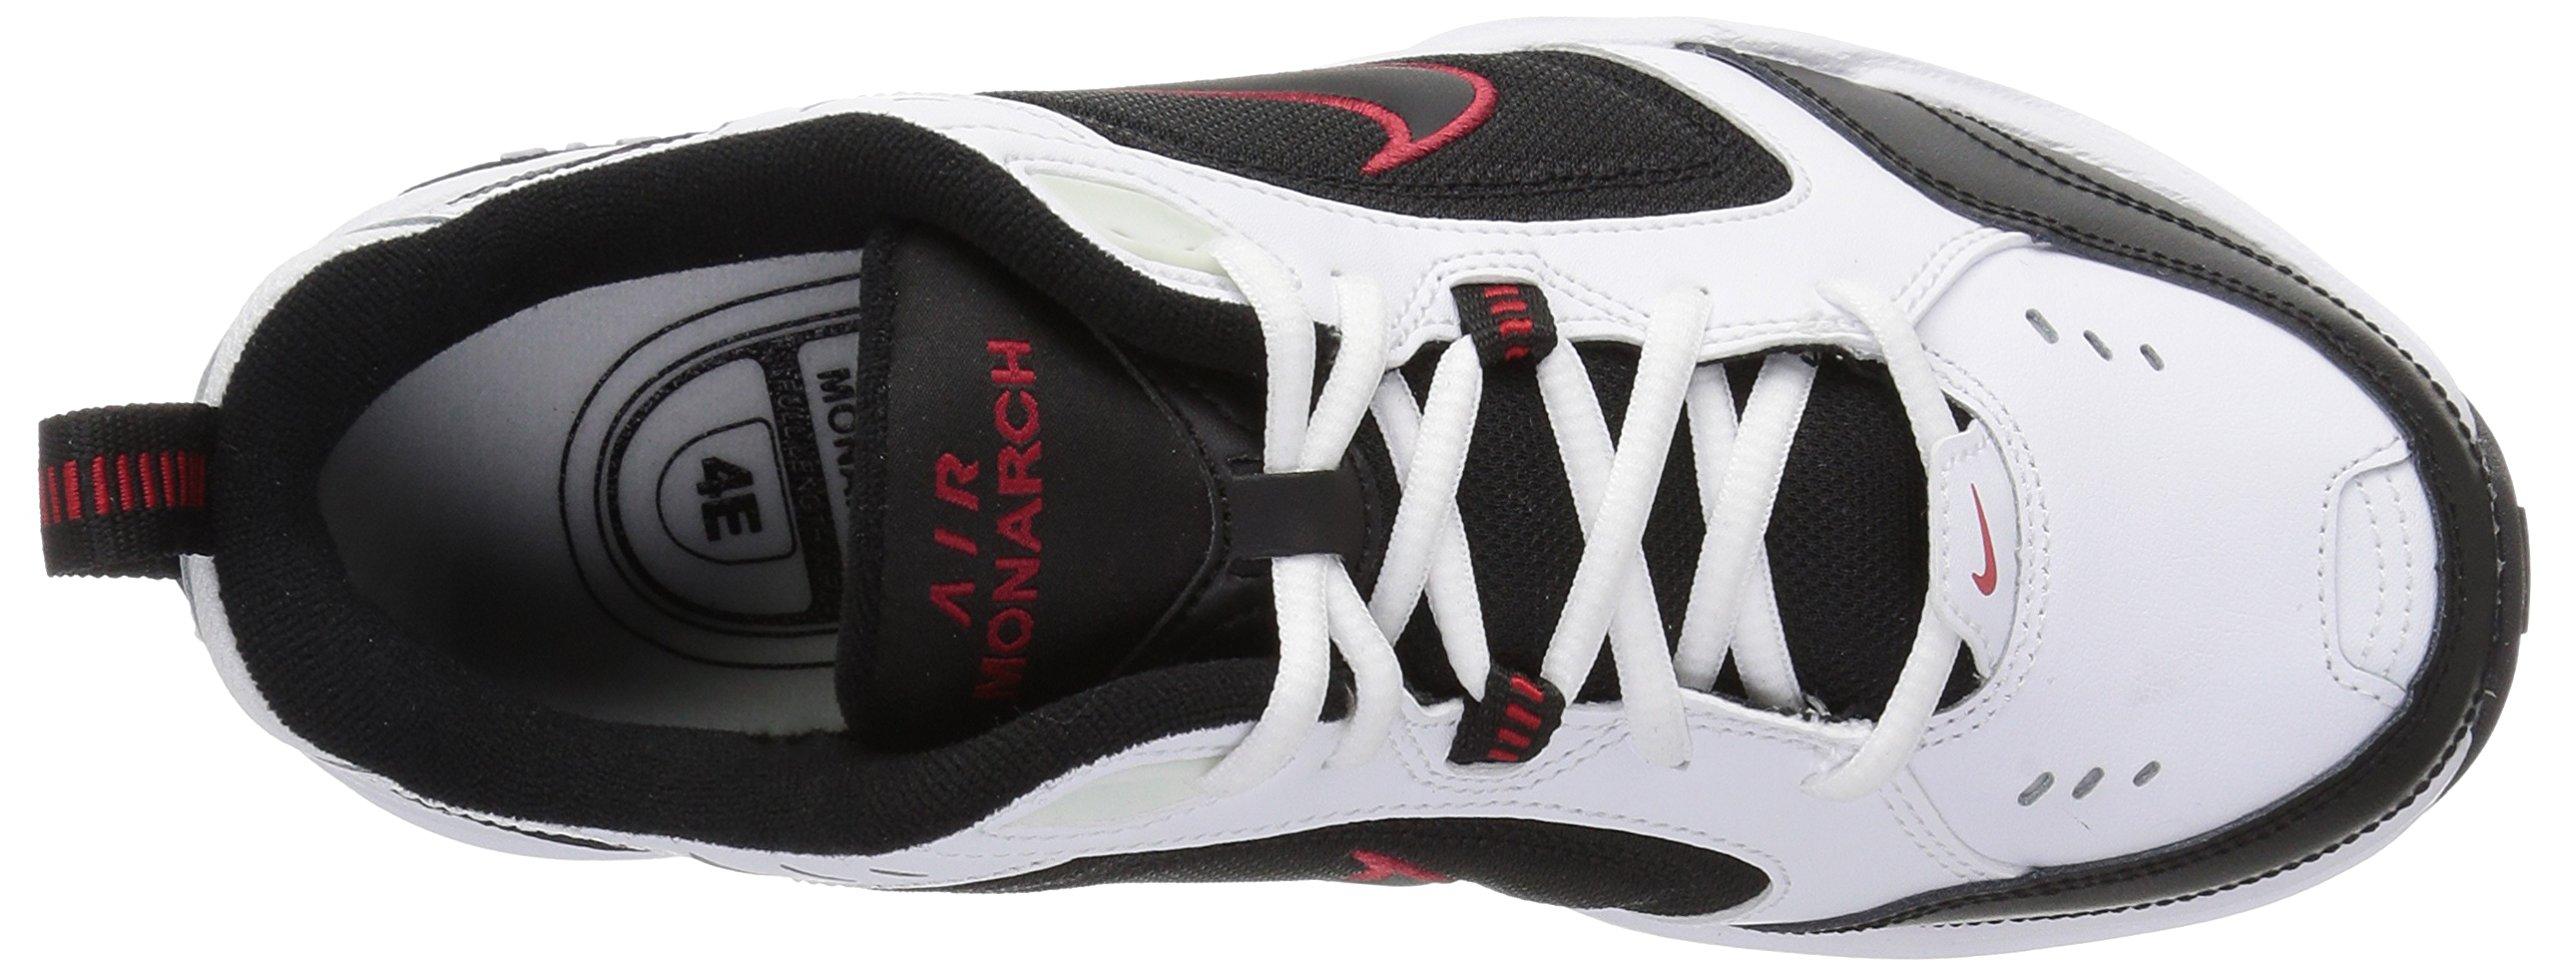 Nike-Men-039-s-Air-Monarch-IV-Cross-Trainer-Sneaker-416355 thumbnail 14